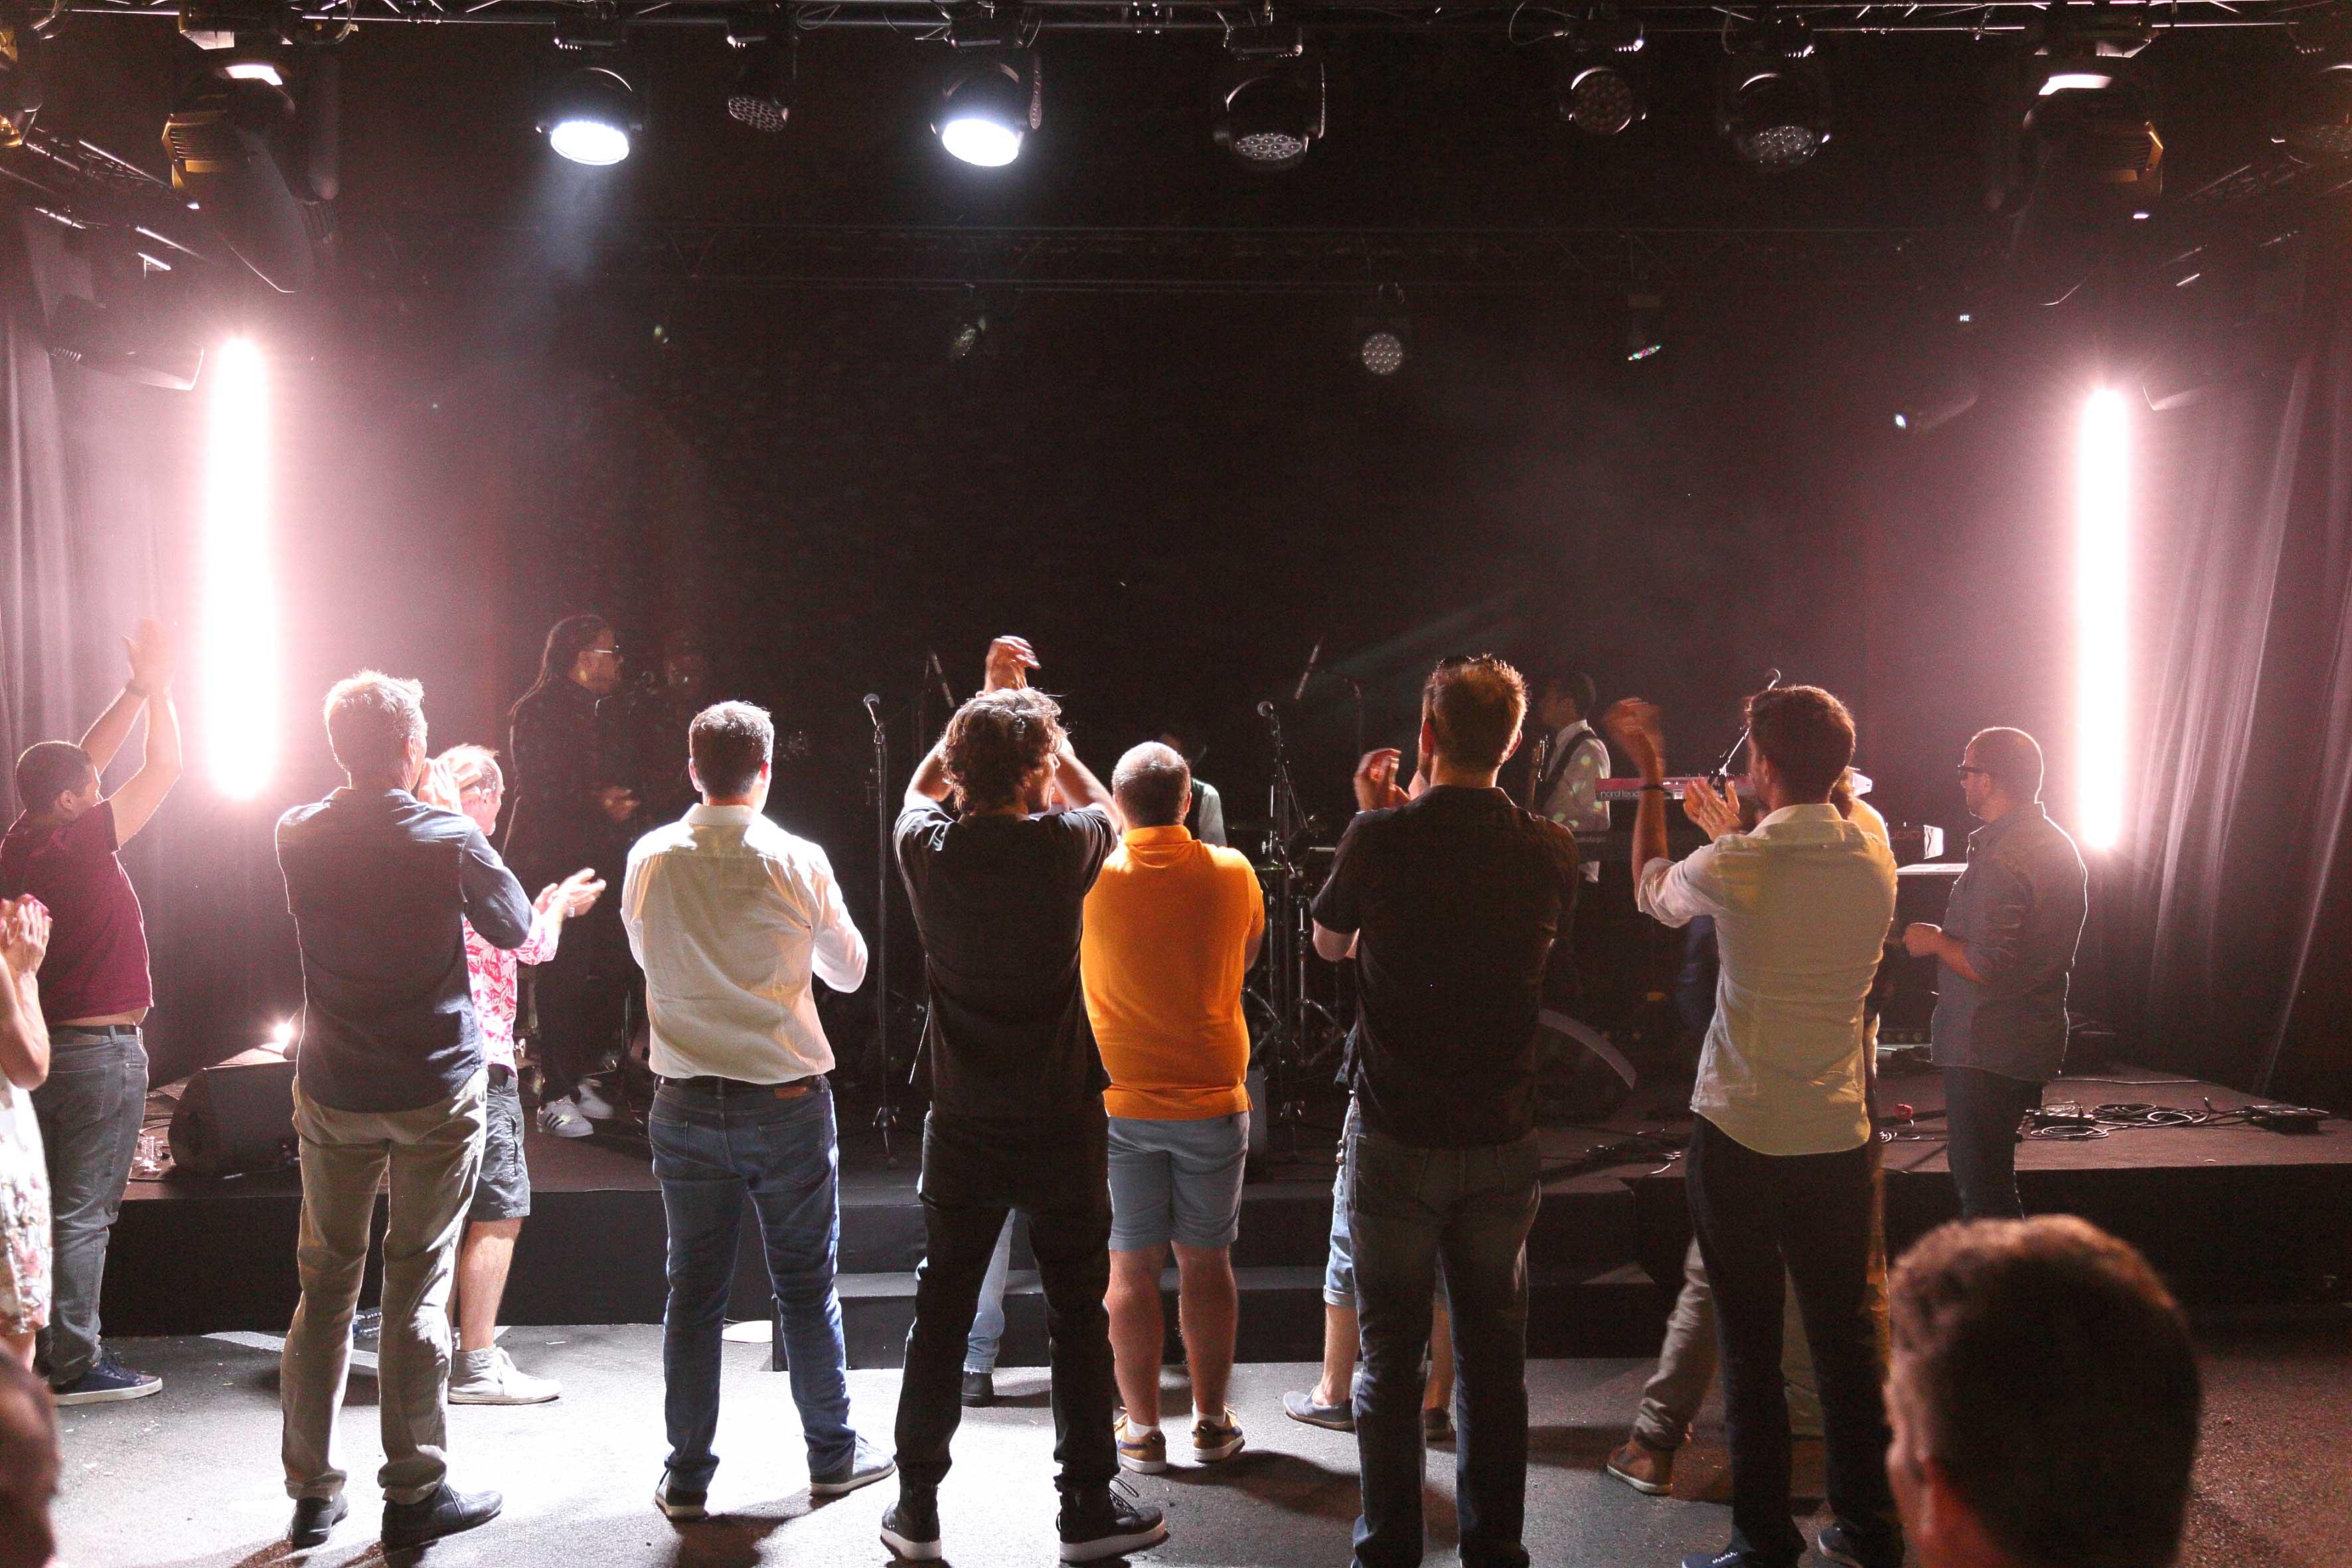 aucop-soiree-wissous-label-spectacle-29-juin-maxime-massiera-audiovisuel-event-evenementiel